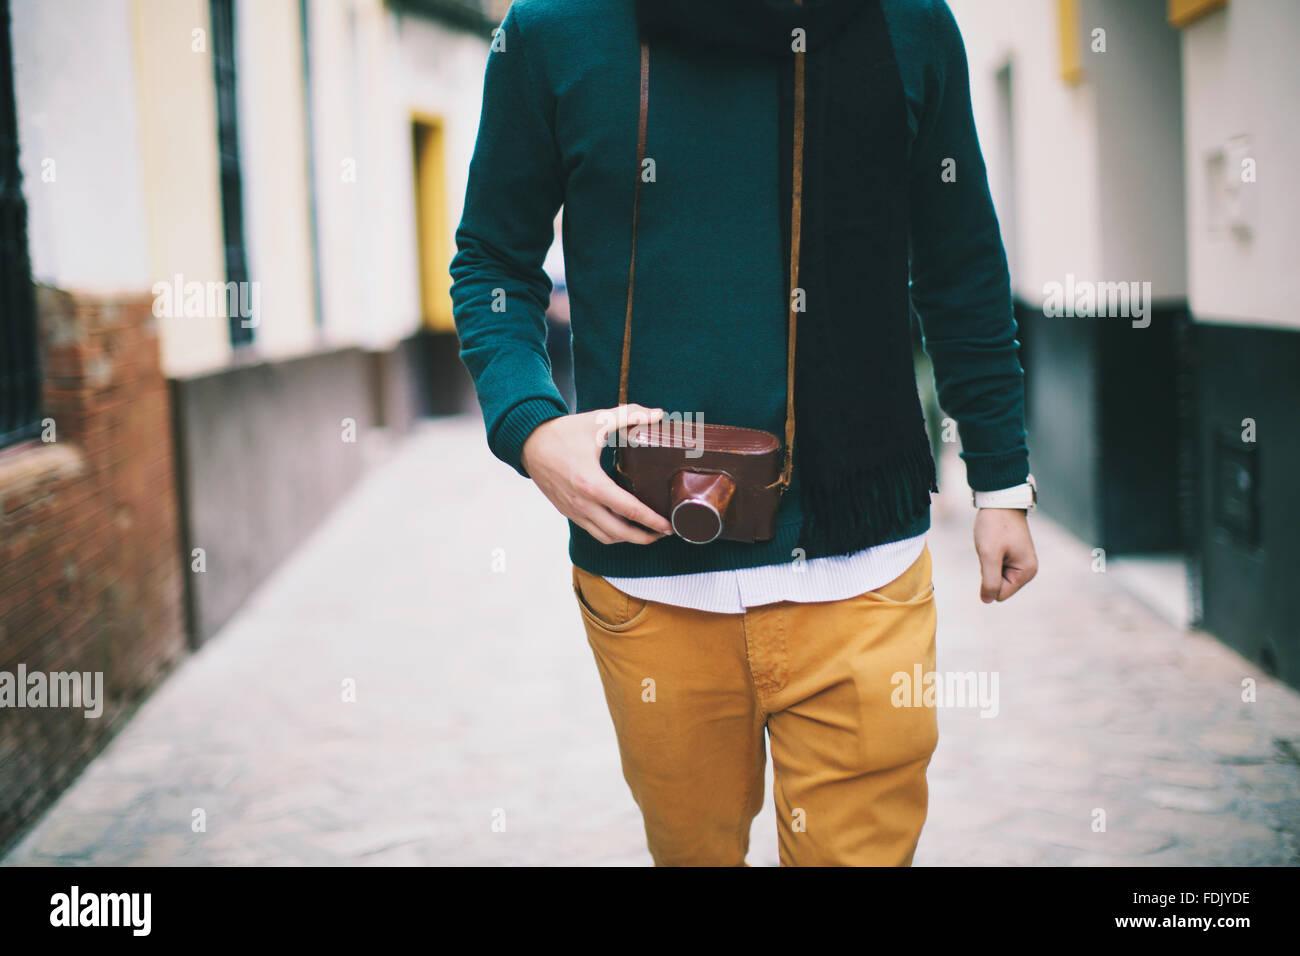 Man walking down street, holding vintage retro  camera, Seville, Spain - Stock Image